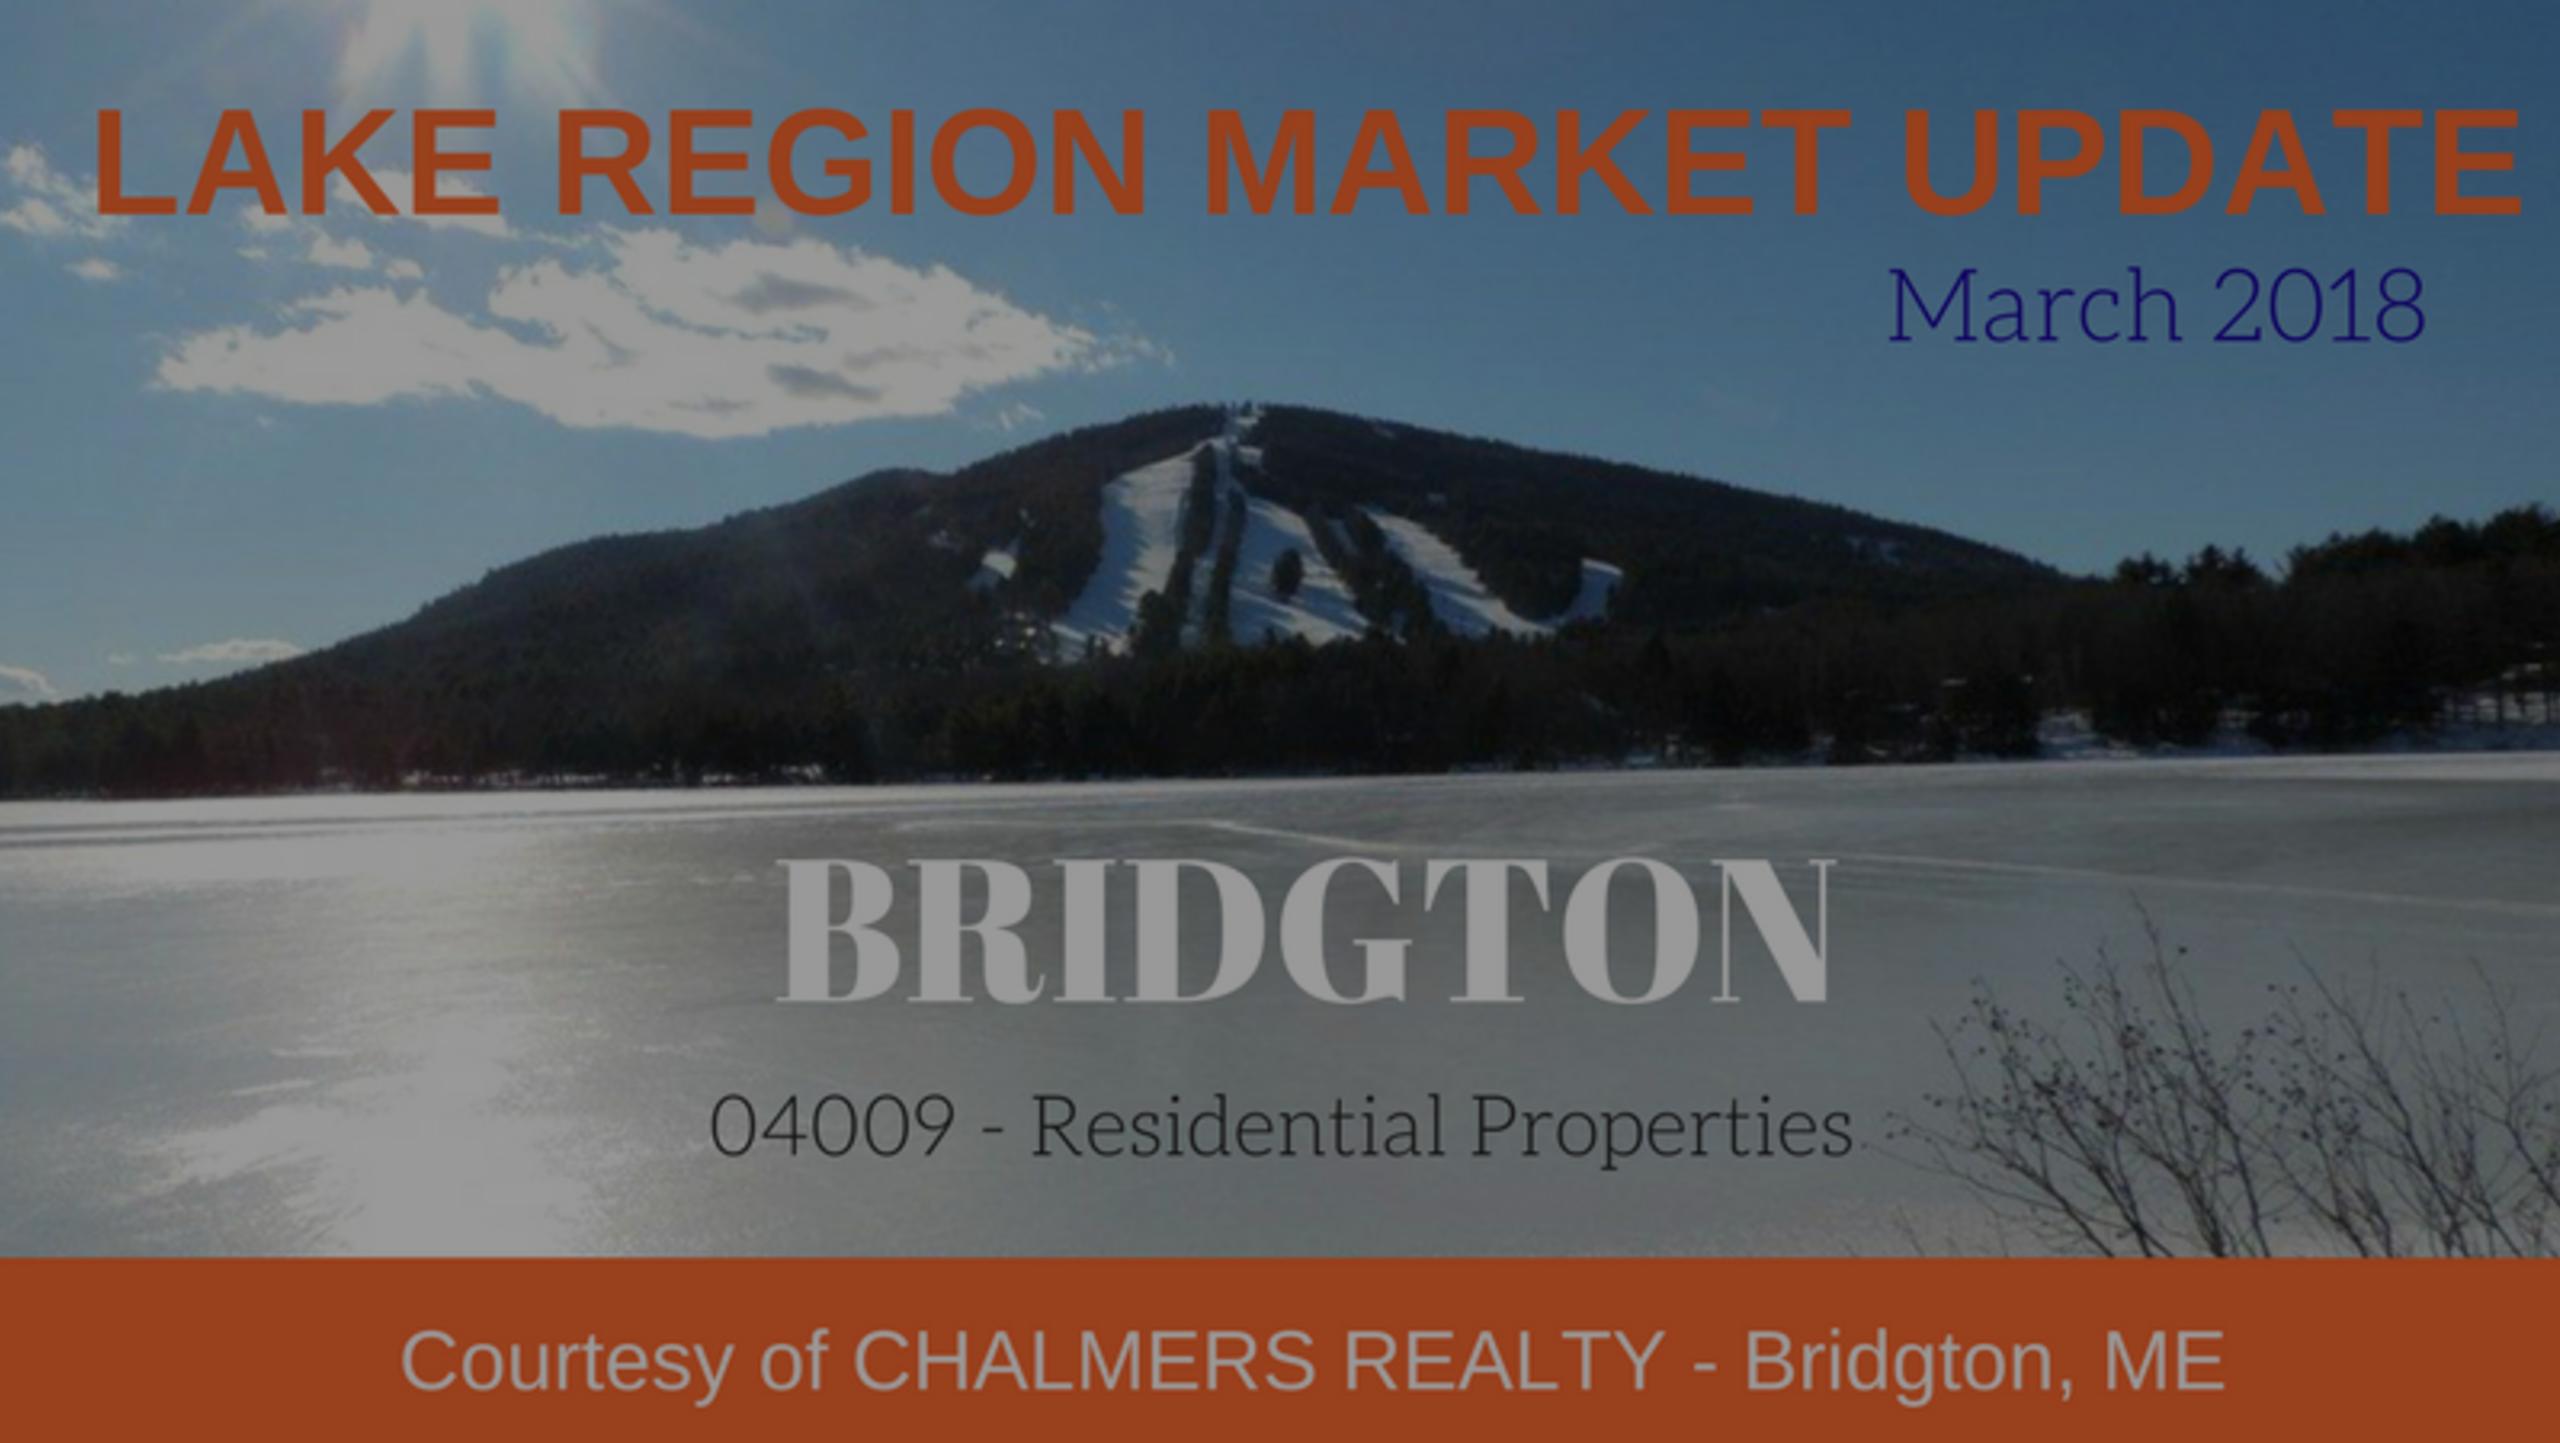 LAKE REGION MARKET UPDATE – BRIDGTON